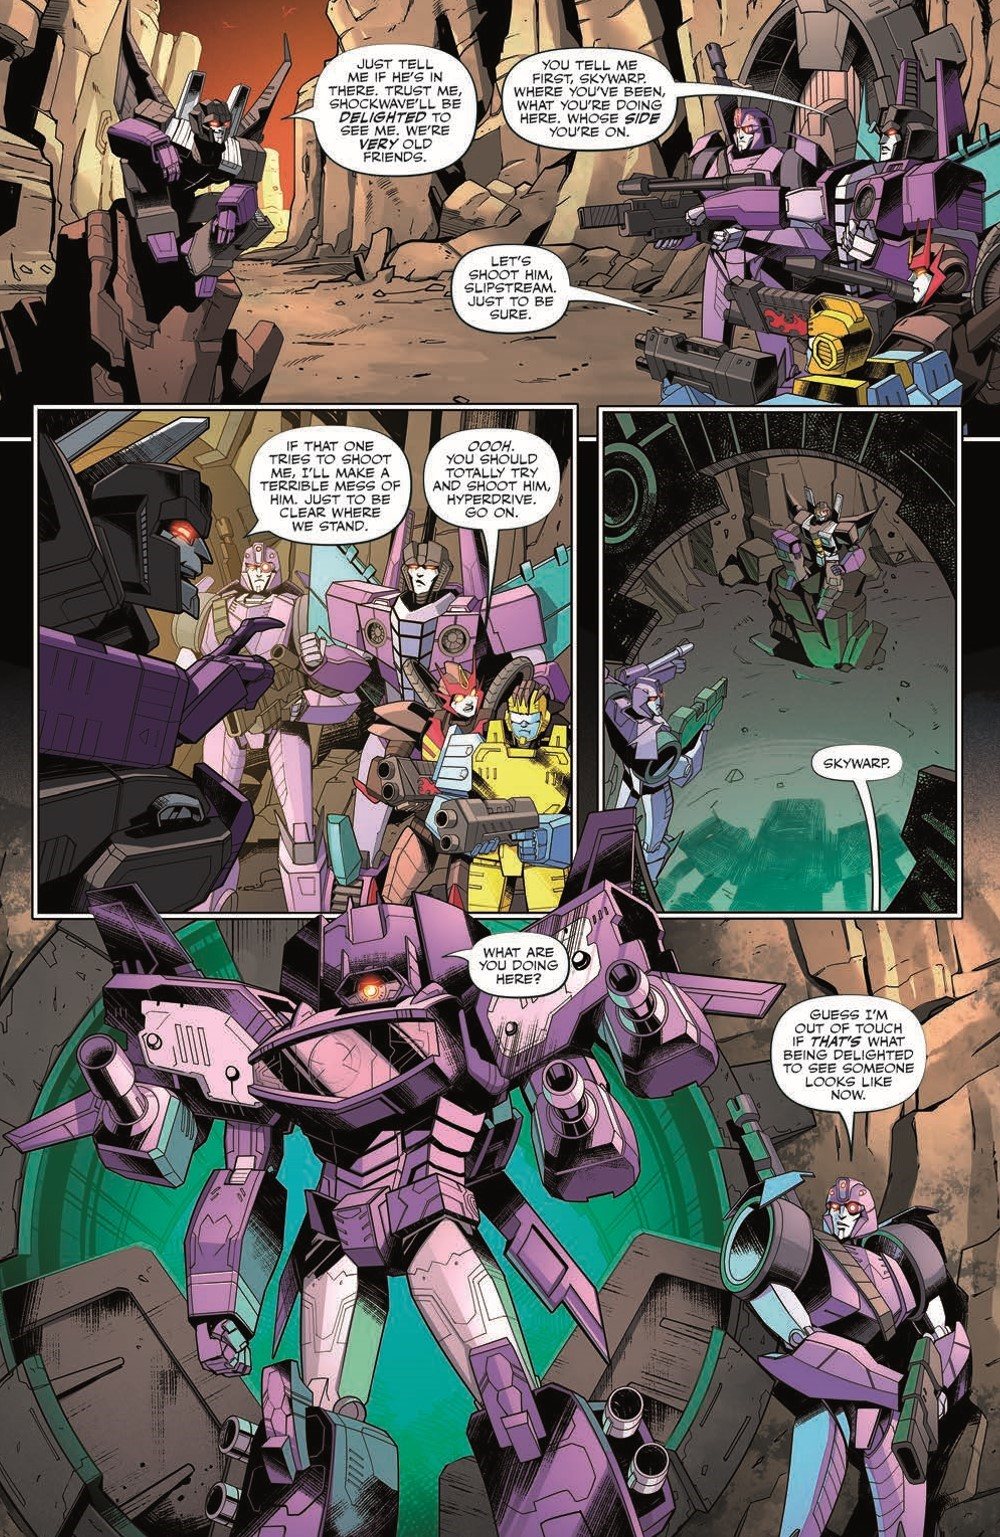 TF35-pr-7 ComicList Previews: TRANSFORMERS #35